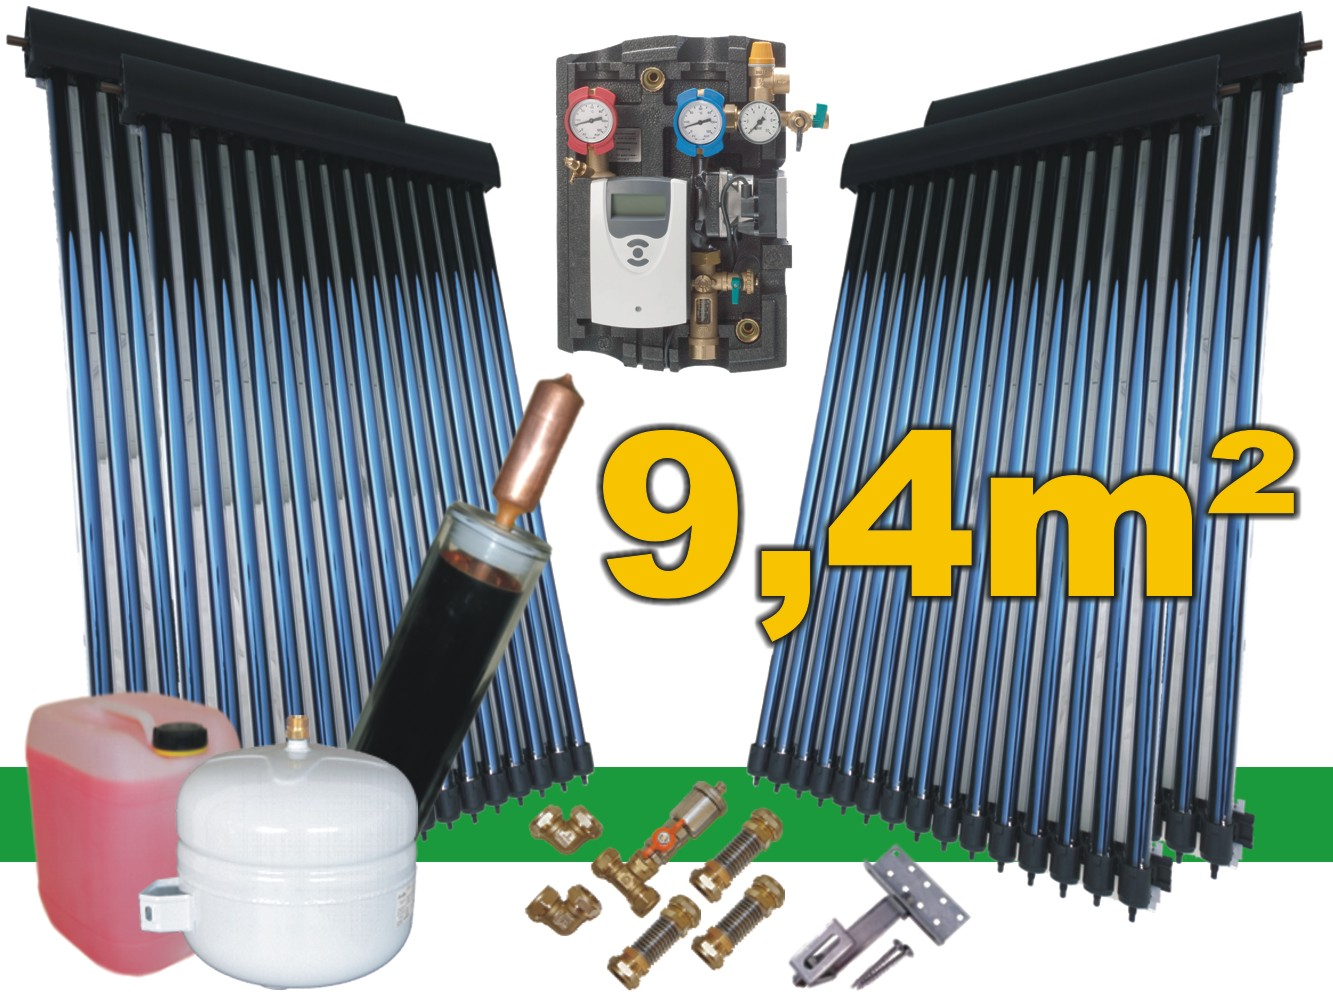 solaranlage komplettpaket 9 4 m bafa r hrenkollektor warmwasser power heatpipe ebay. Black Bedroom Furniture Sets. Home Design Ideas